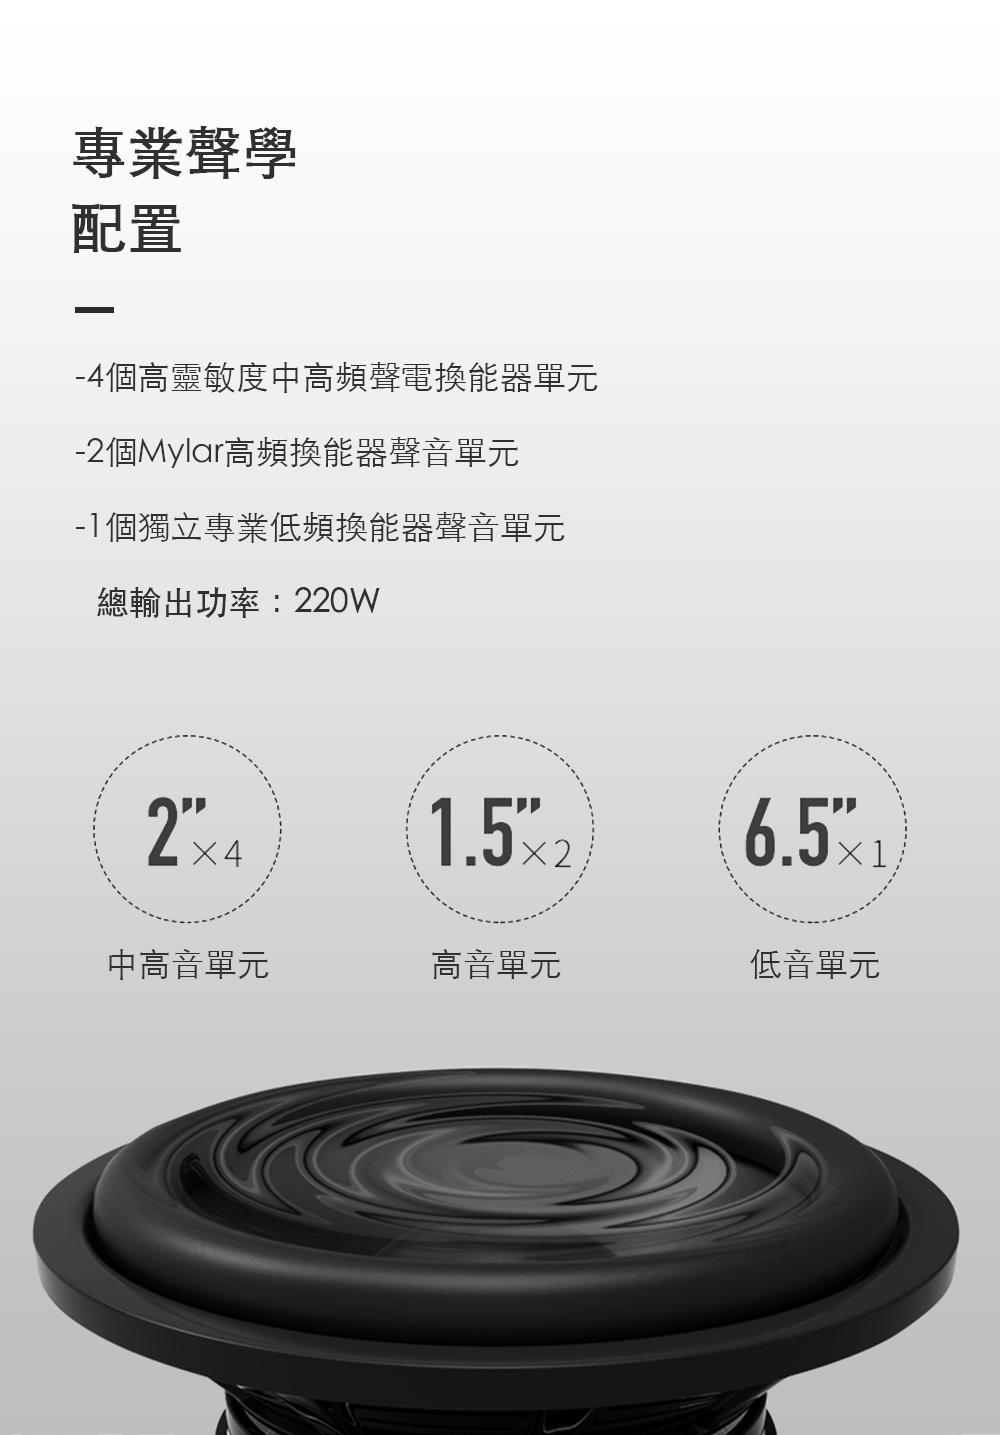 JBL-CINEMA-KTV350-Catalogue-(繁體中文)5.png